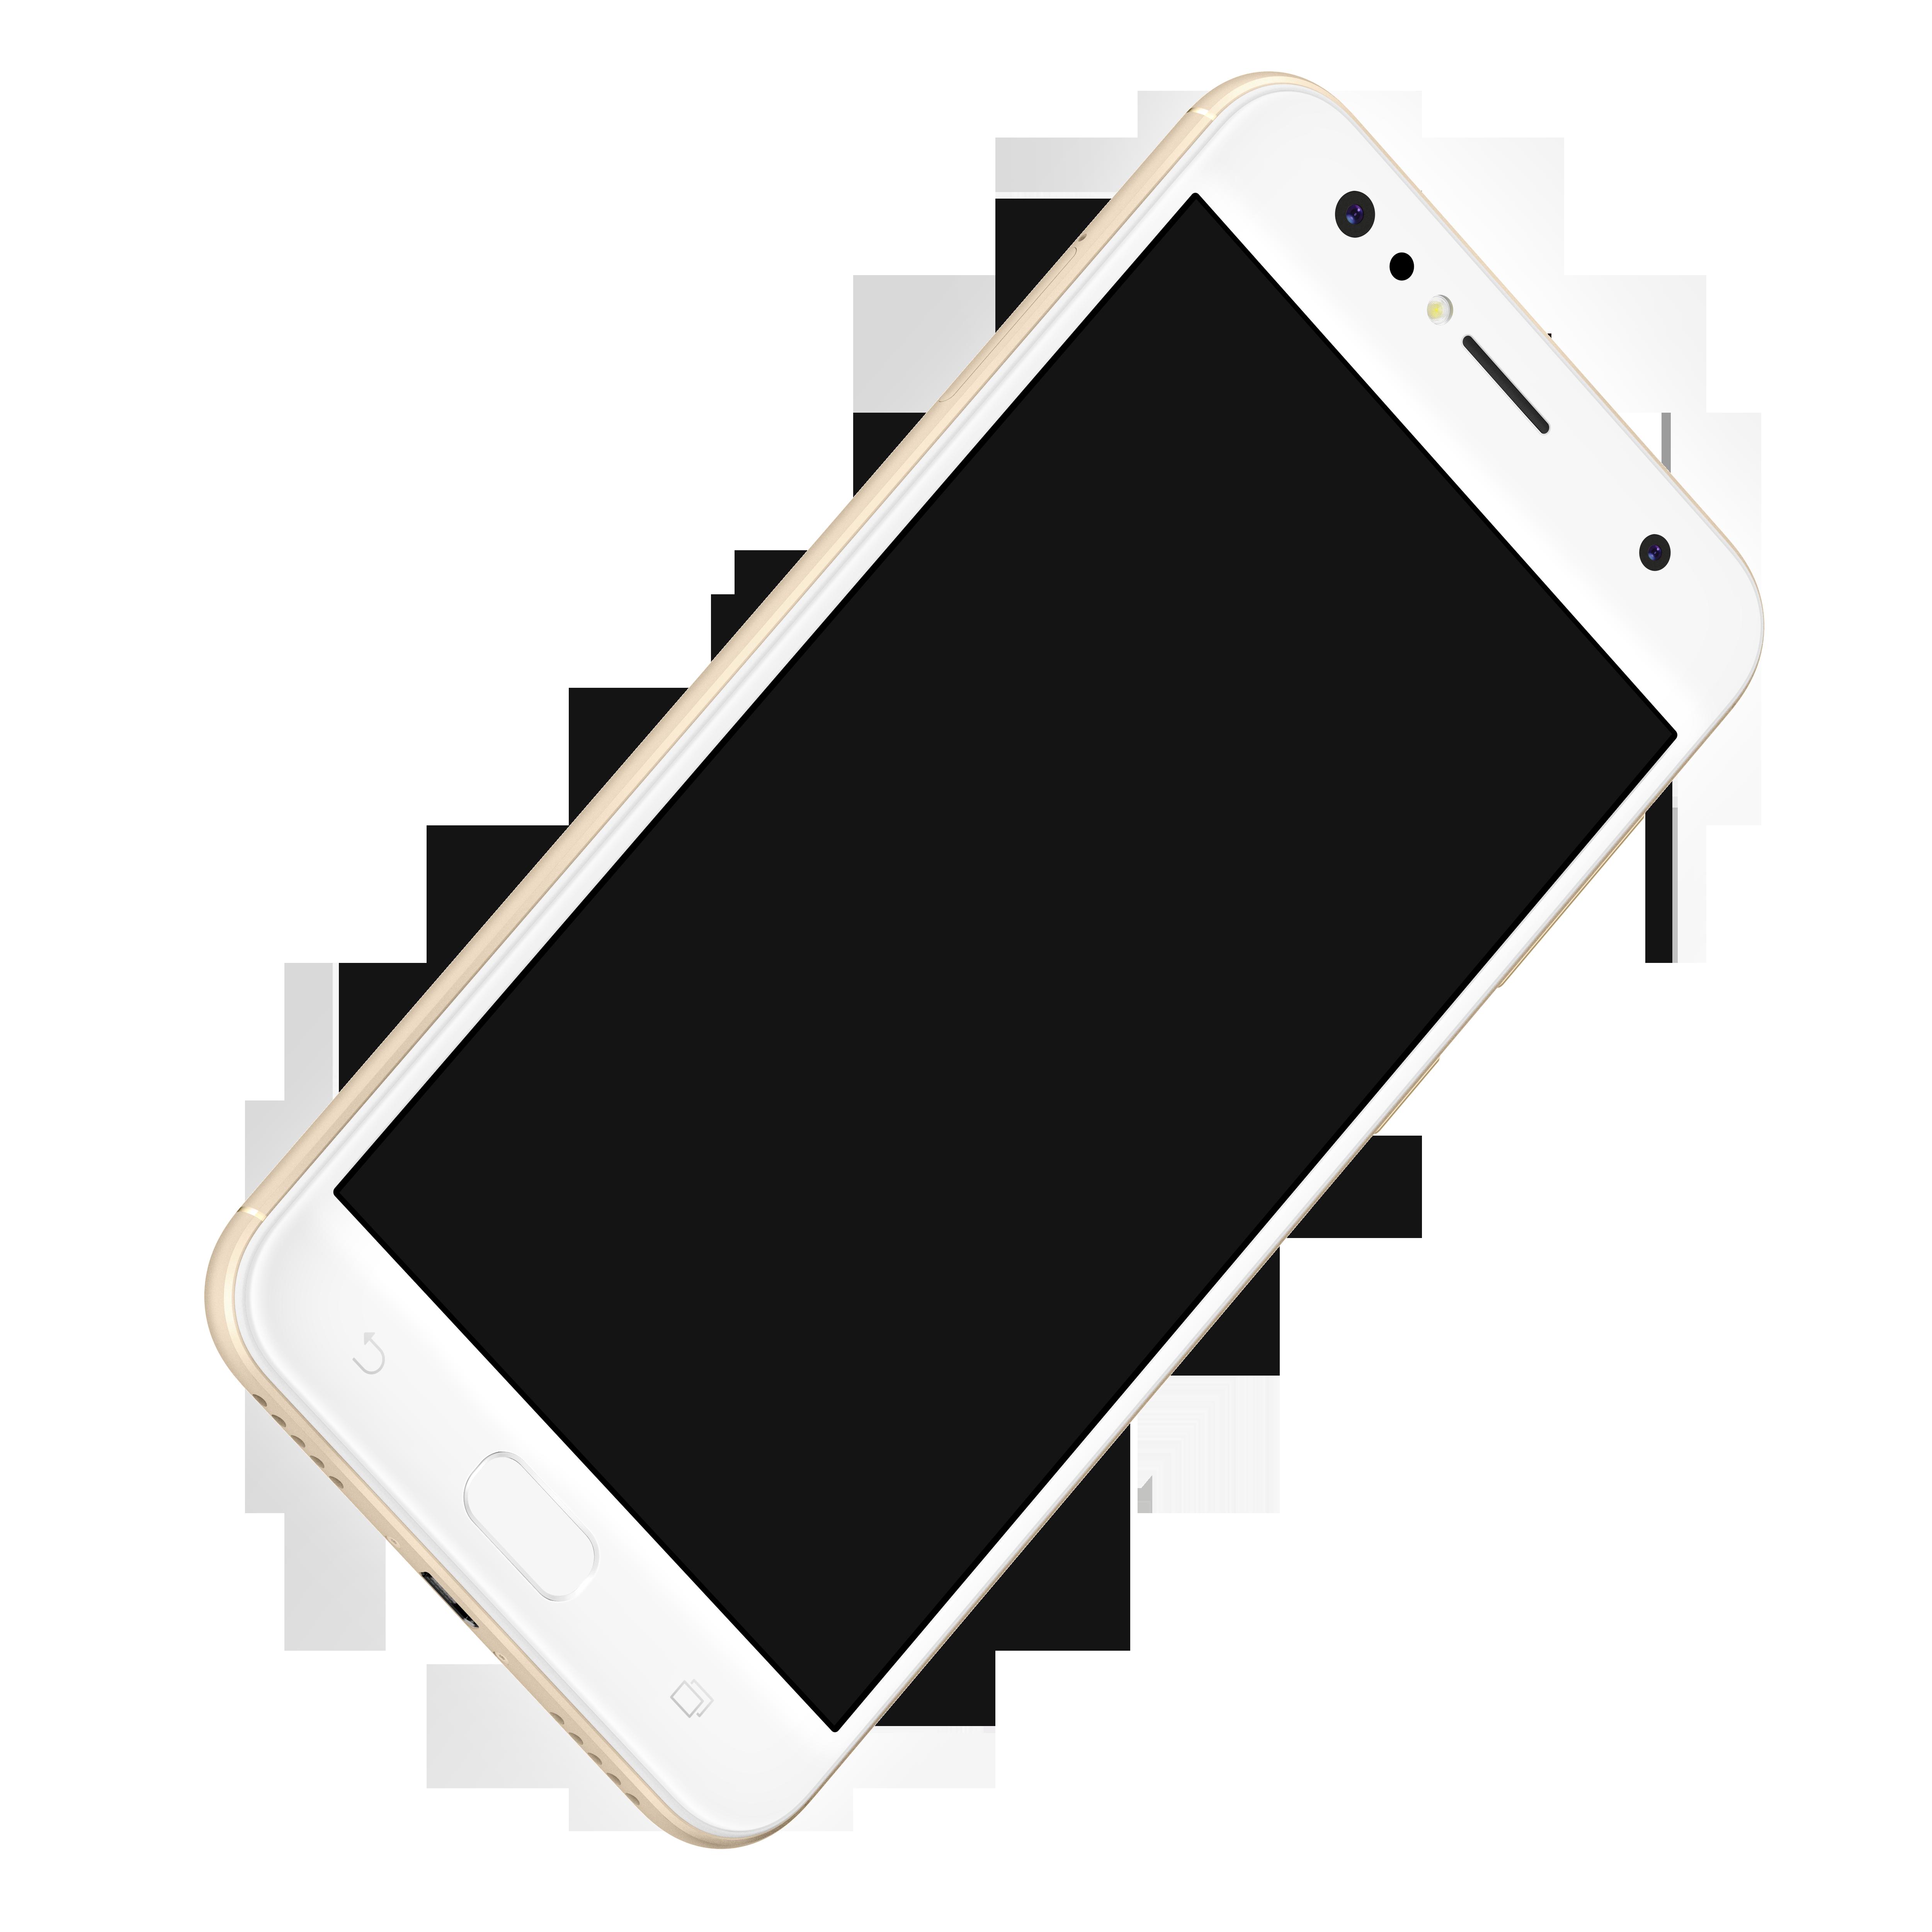 Asus ZenFone 4 Selfie Dual Camera